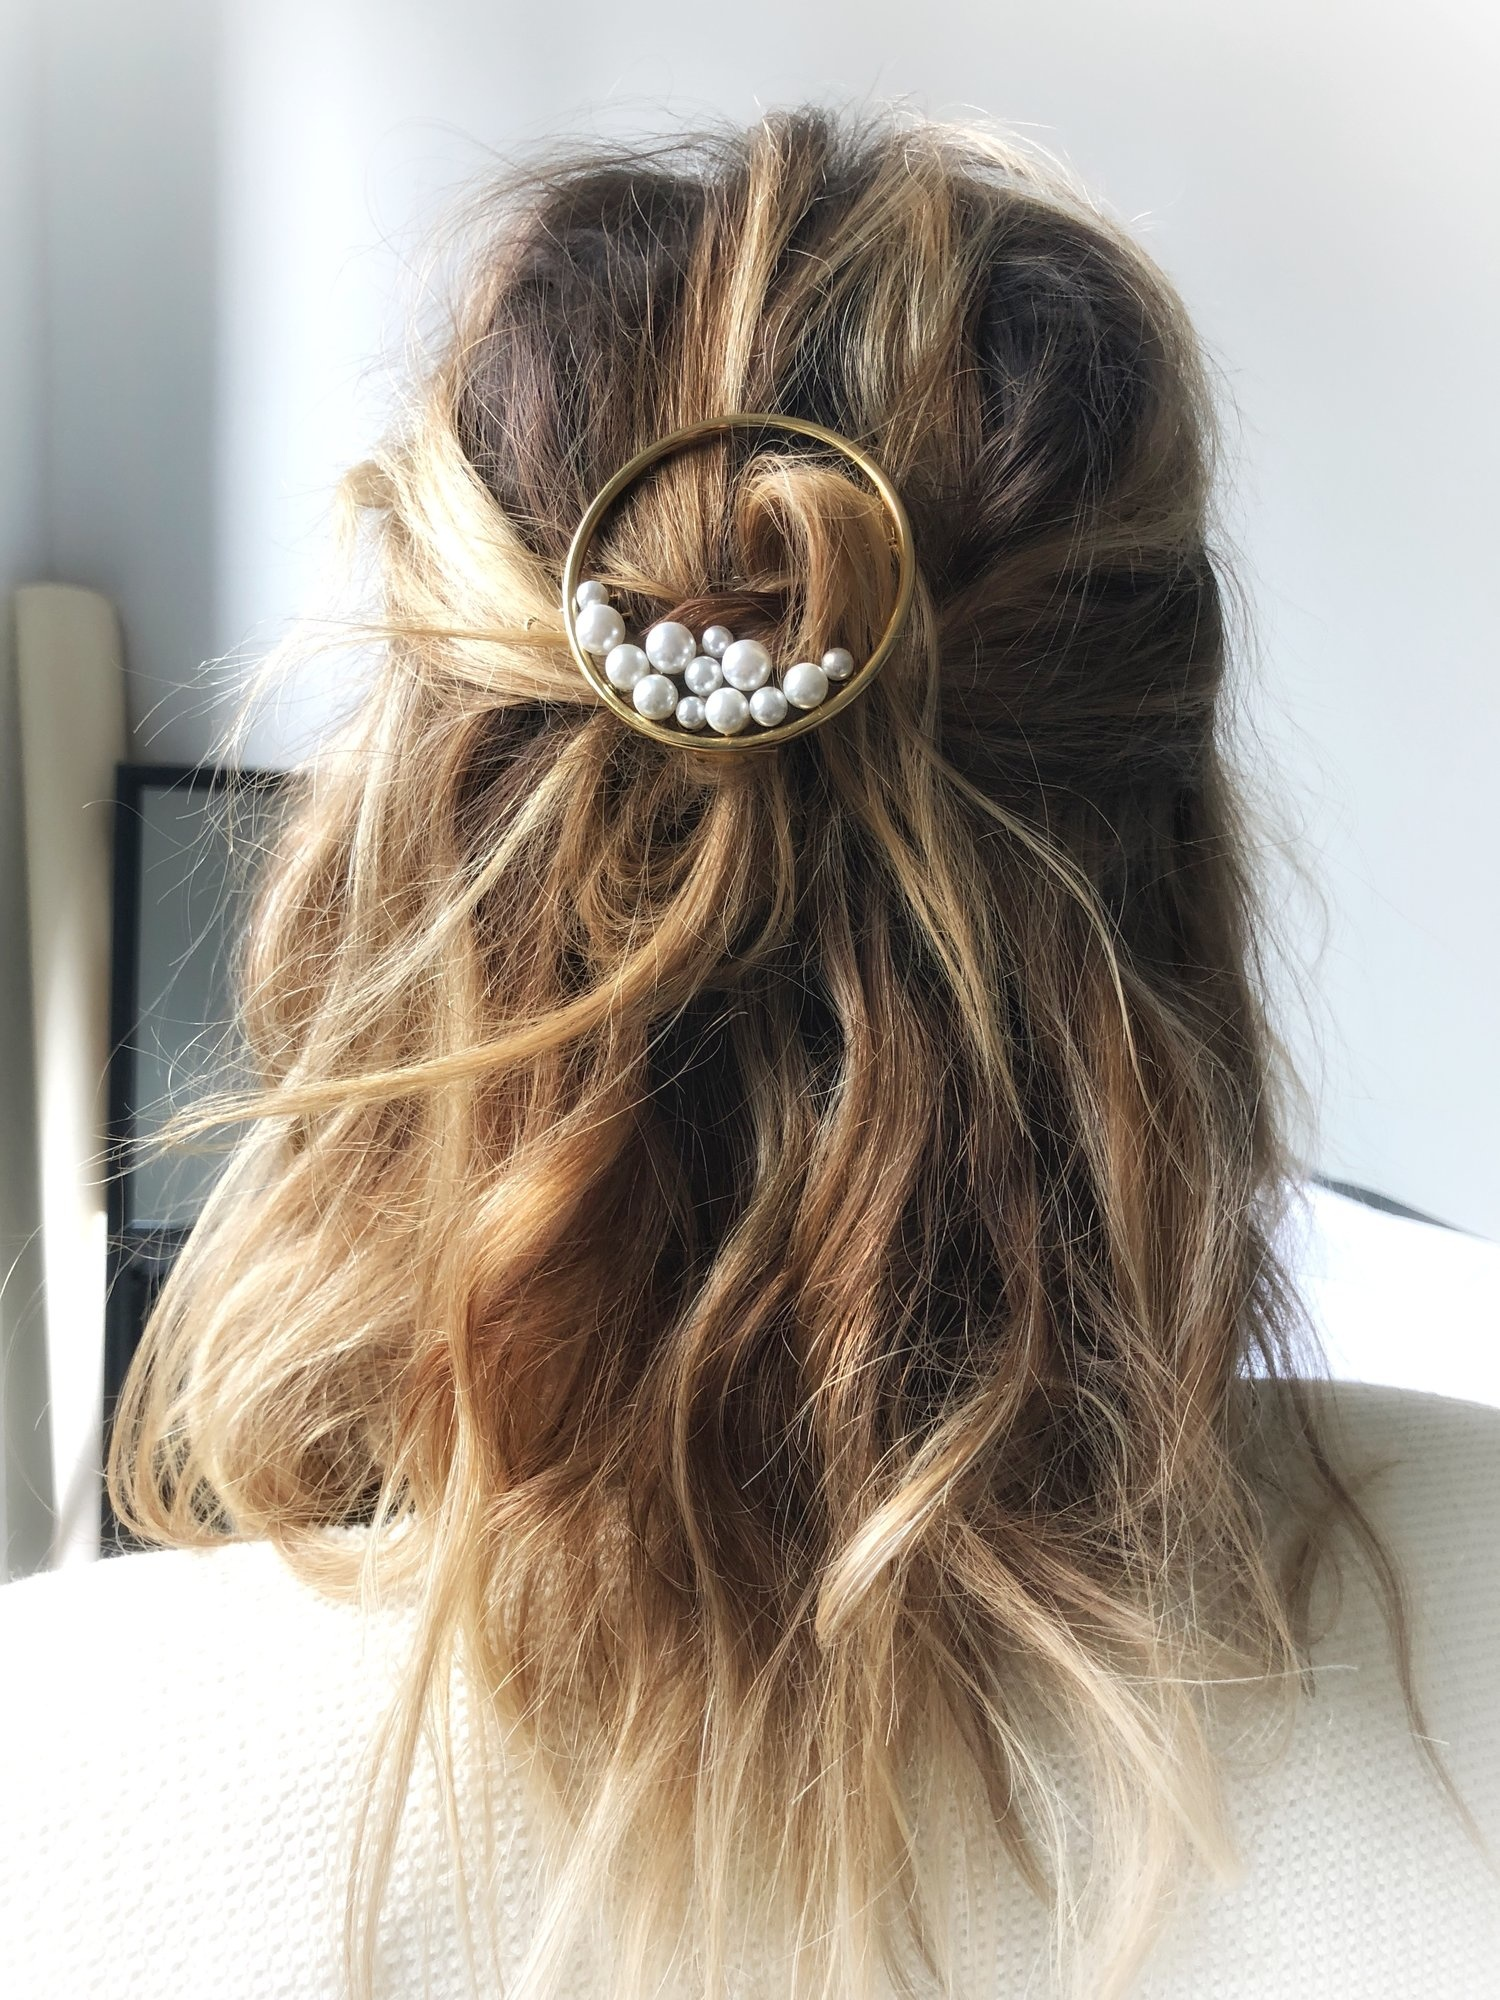 Lelet NY Ocean pearl ring barrette